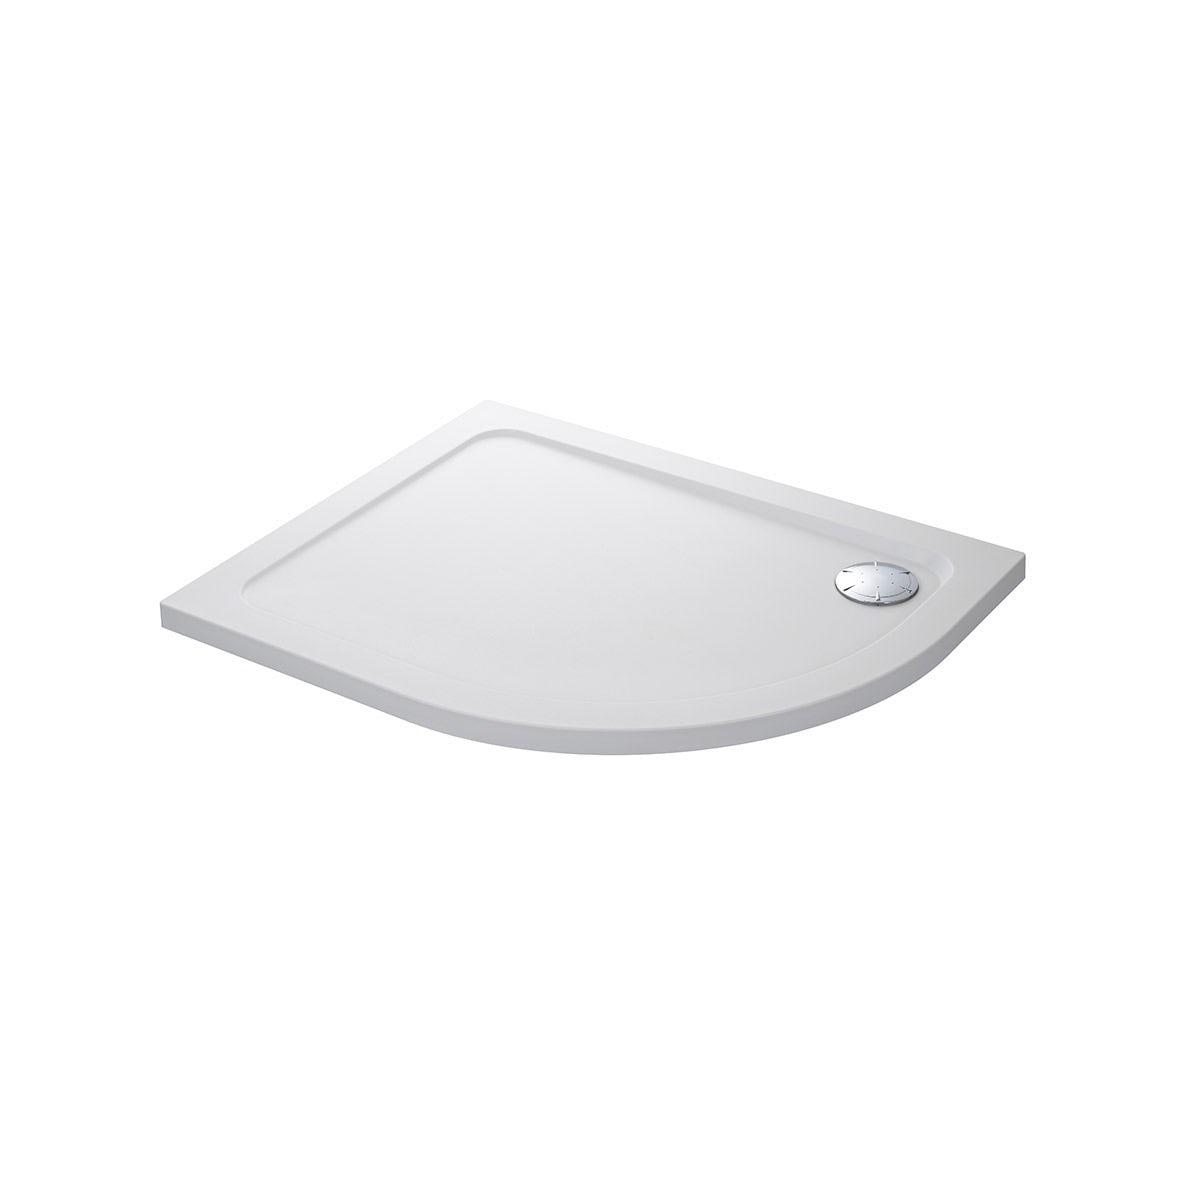 Mira Flight Safe Low Level Antislip Lh Quadrant Shower